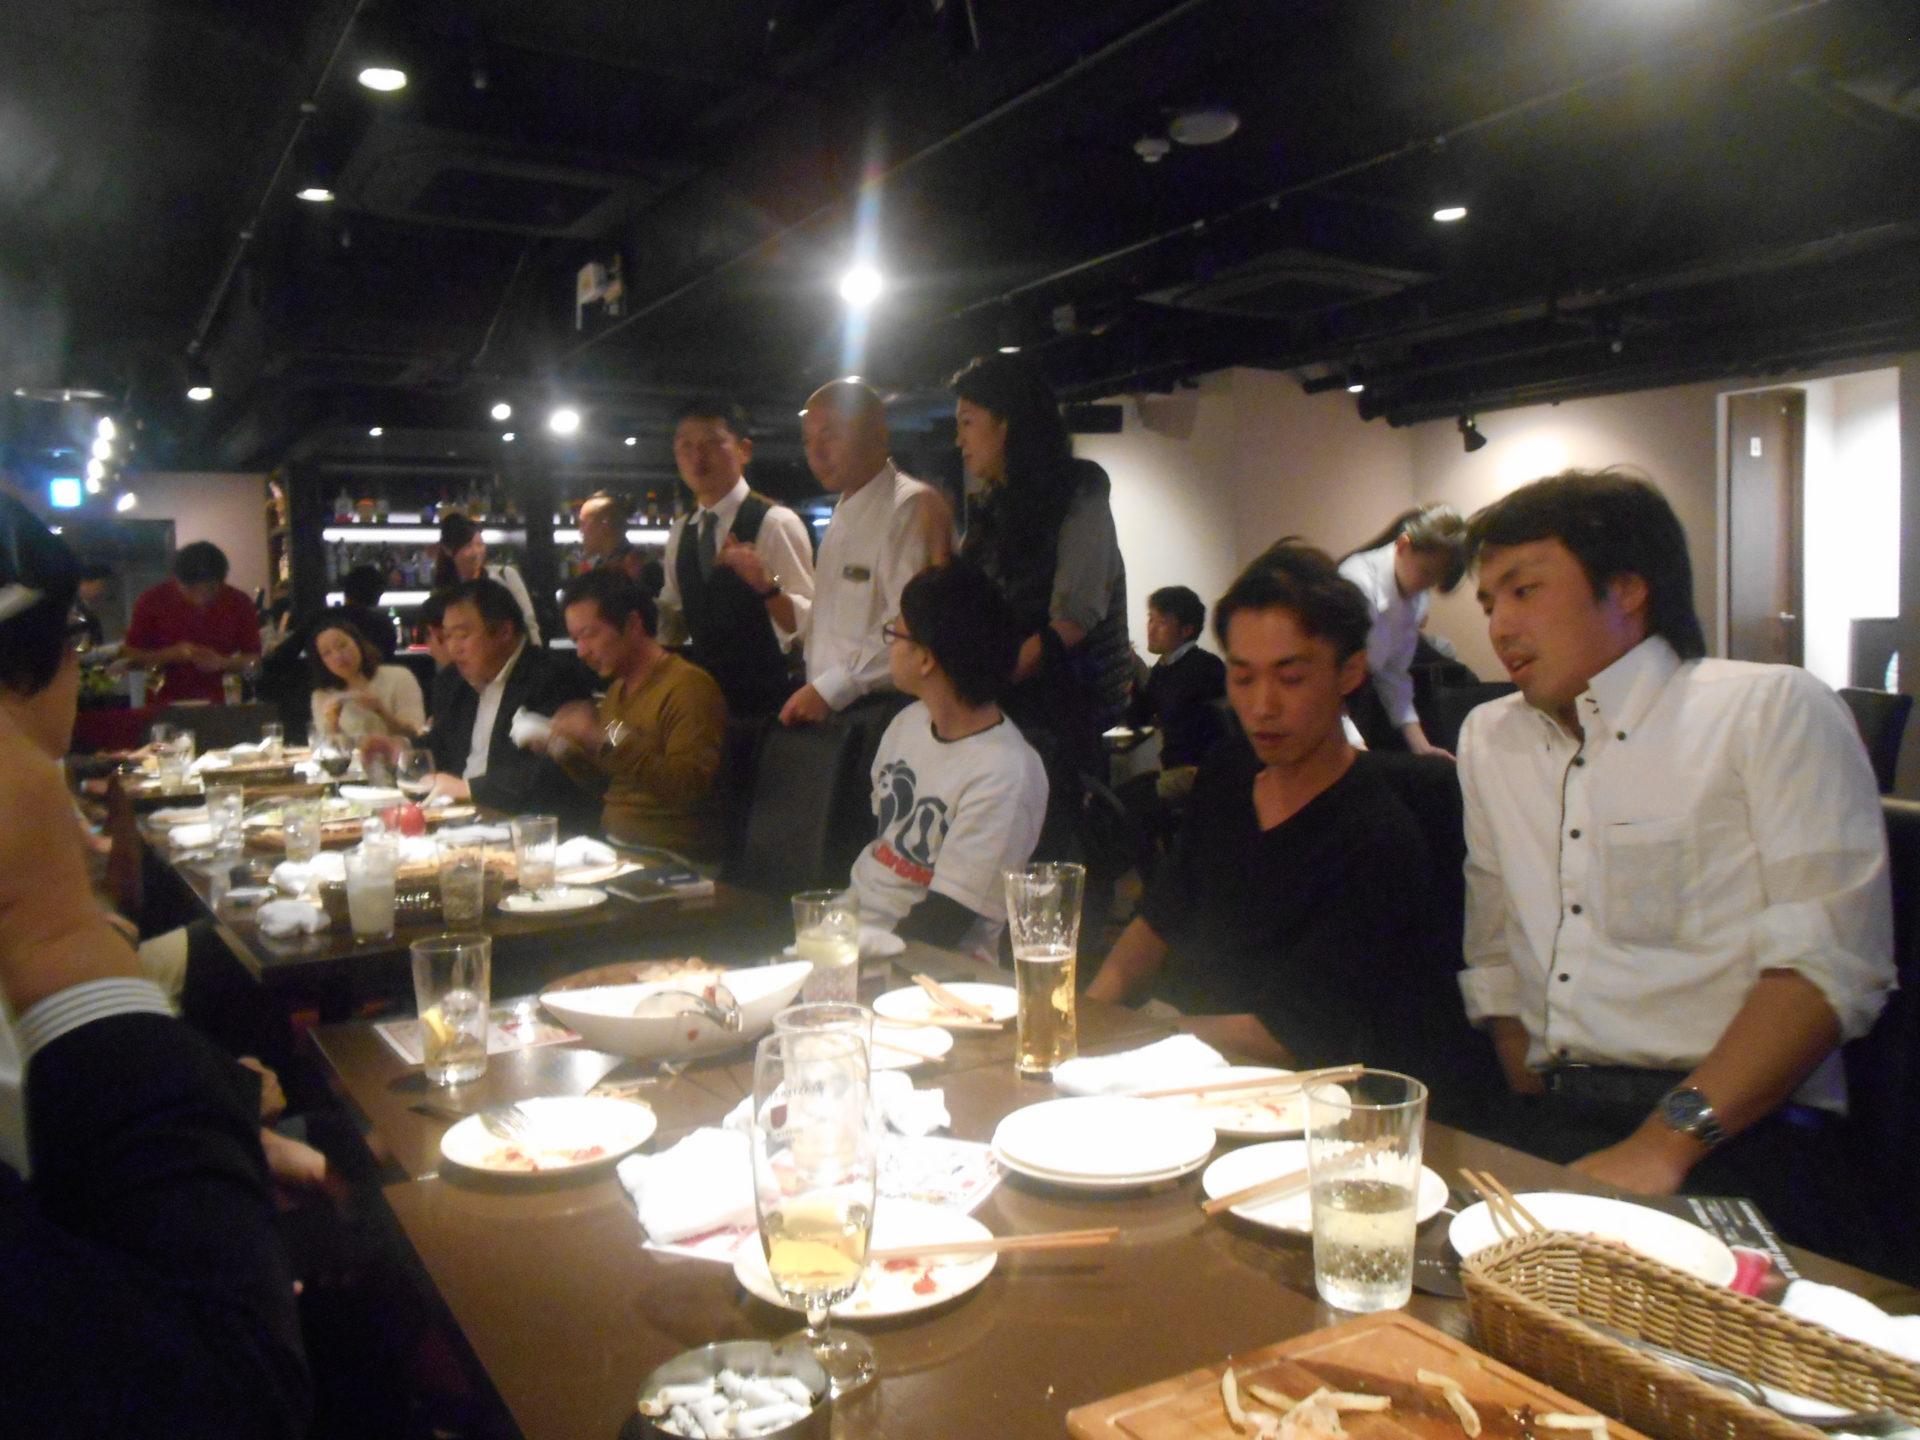 DSCN0327 1920x1440 - 2015年11月16日(月) AOsuki定例飲み会開催致しました。